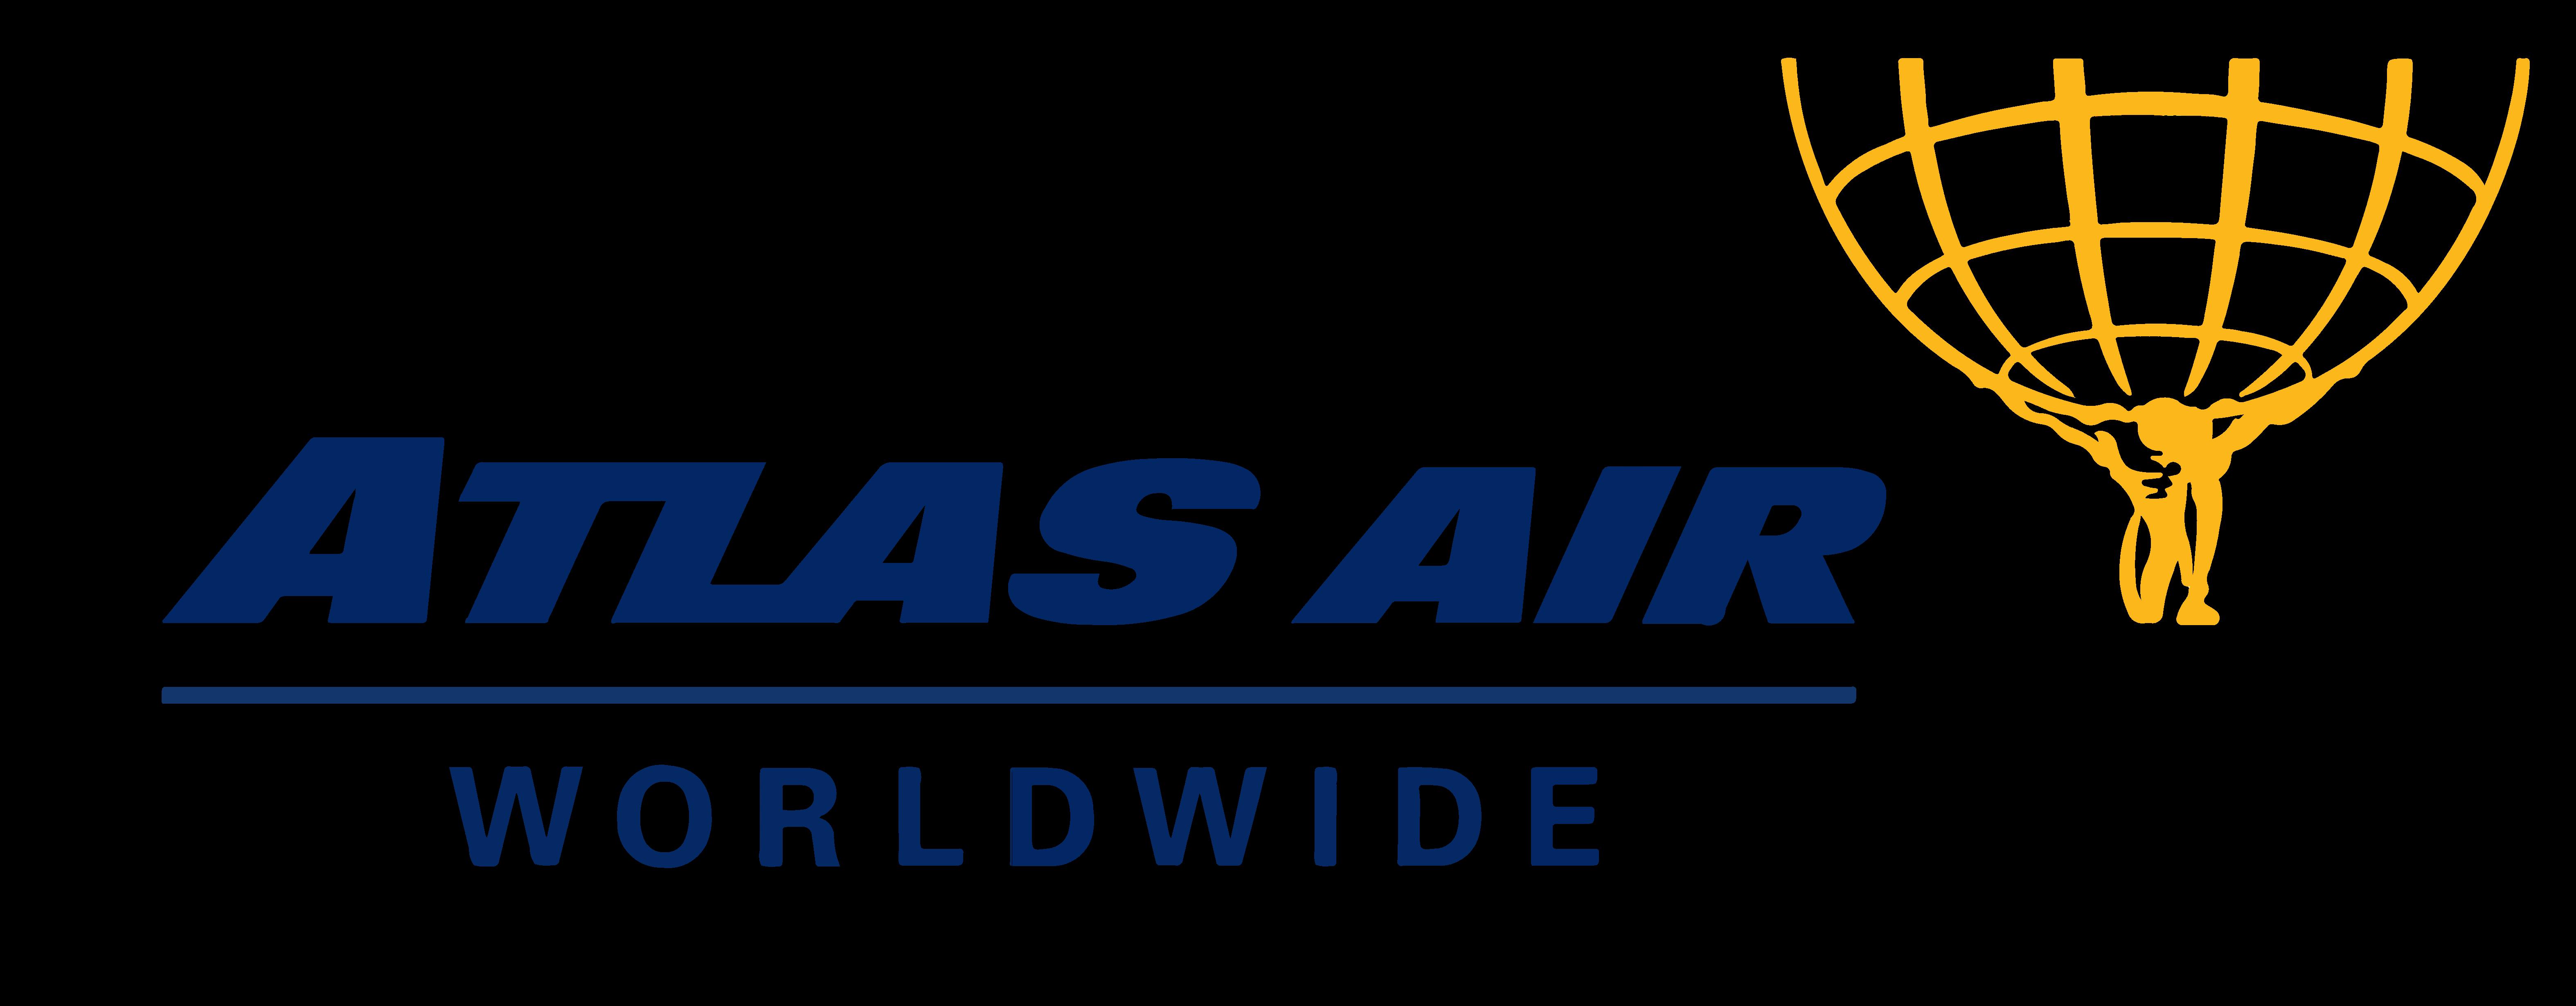 Travel Agency Hawaiian Air